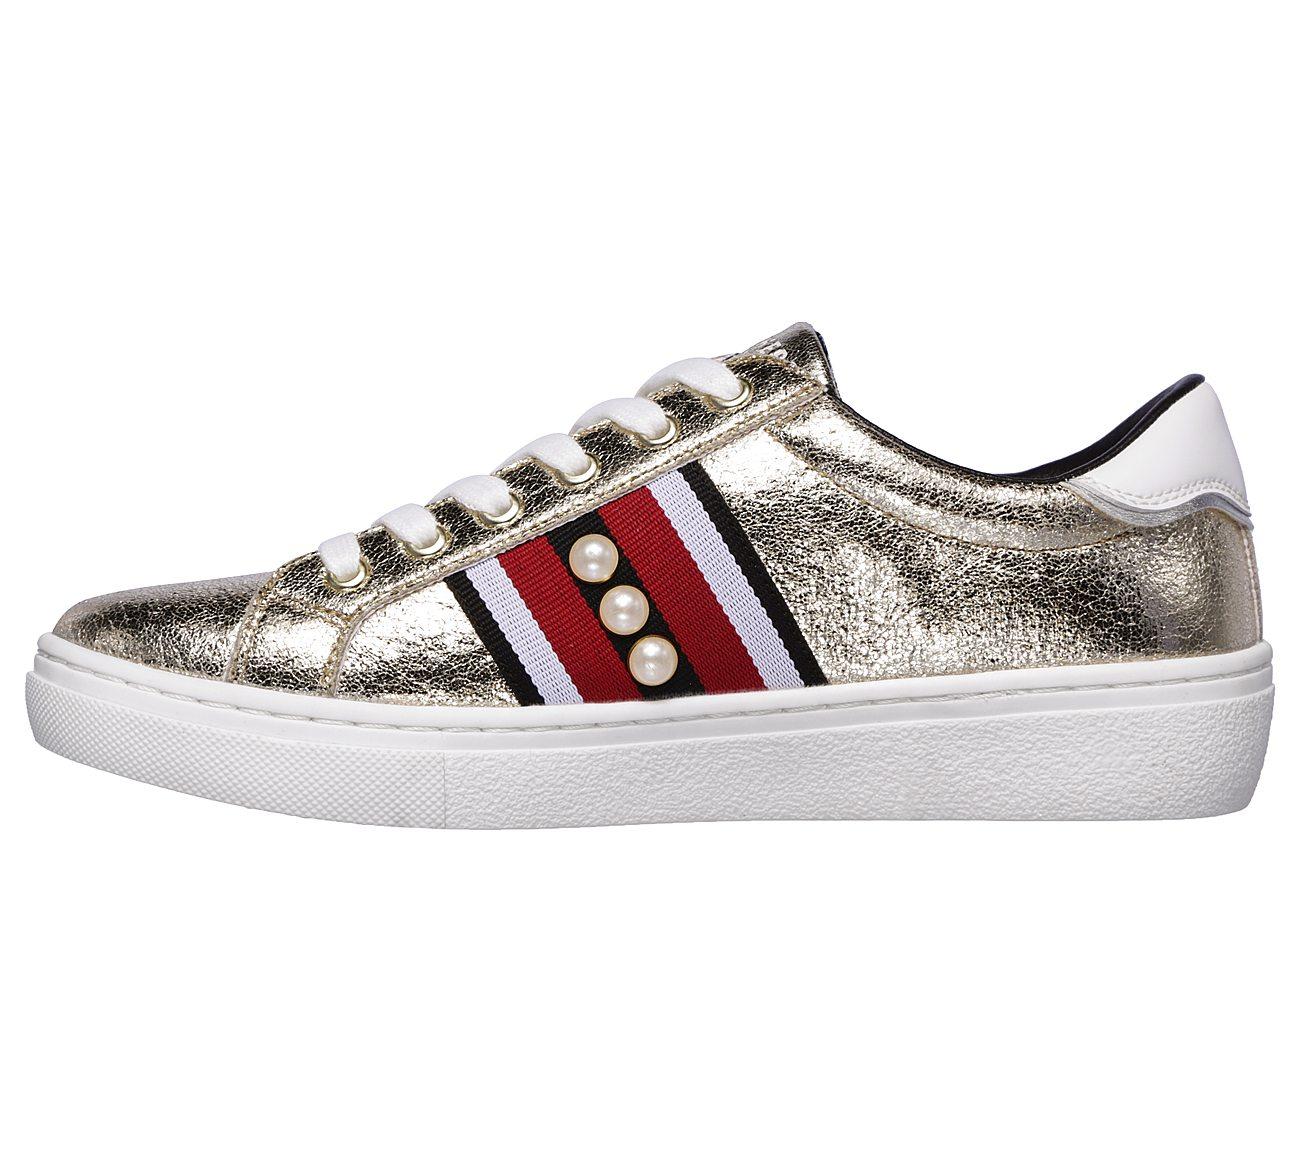 Buy SKECHERS Goldie Jewel Box SKECHER Street Shoes NODnO